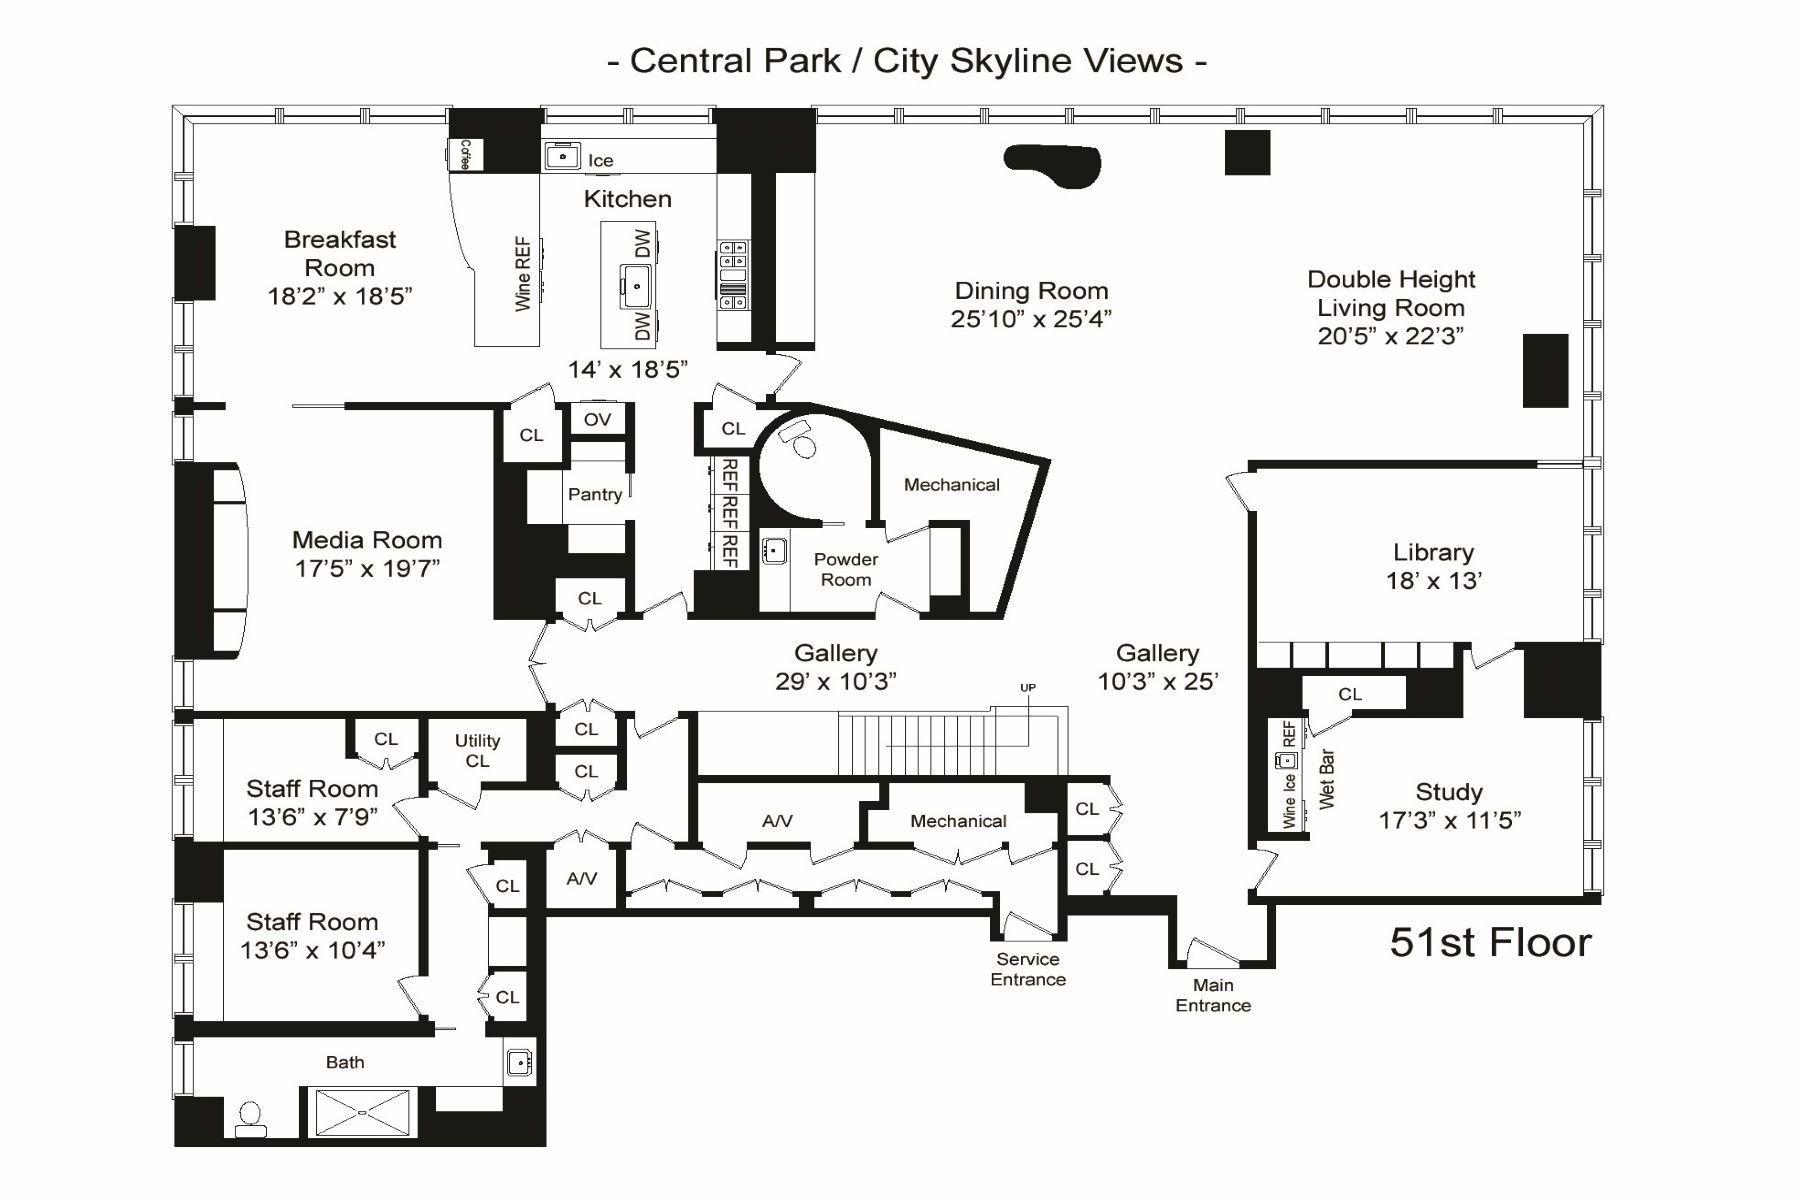 Luxurious Inspiring Penthouses Pent House Apartment Floor Plans Floor Plan Design